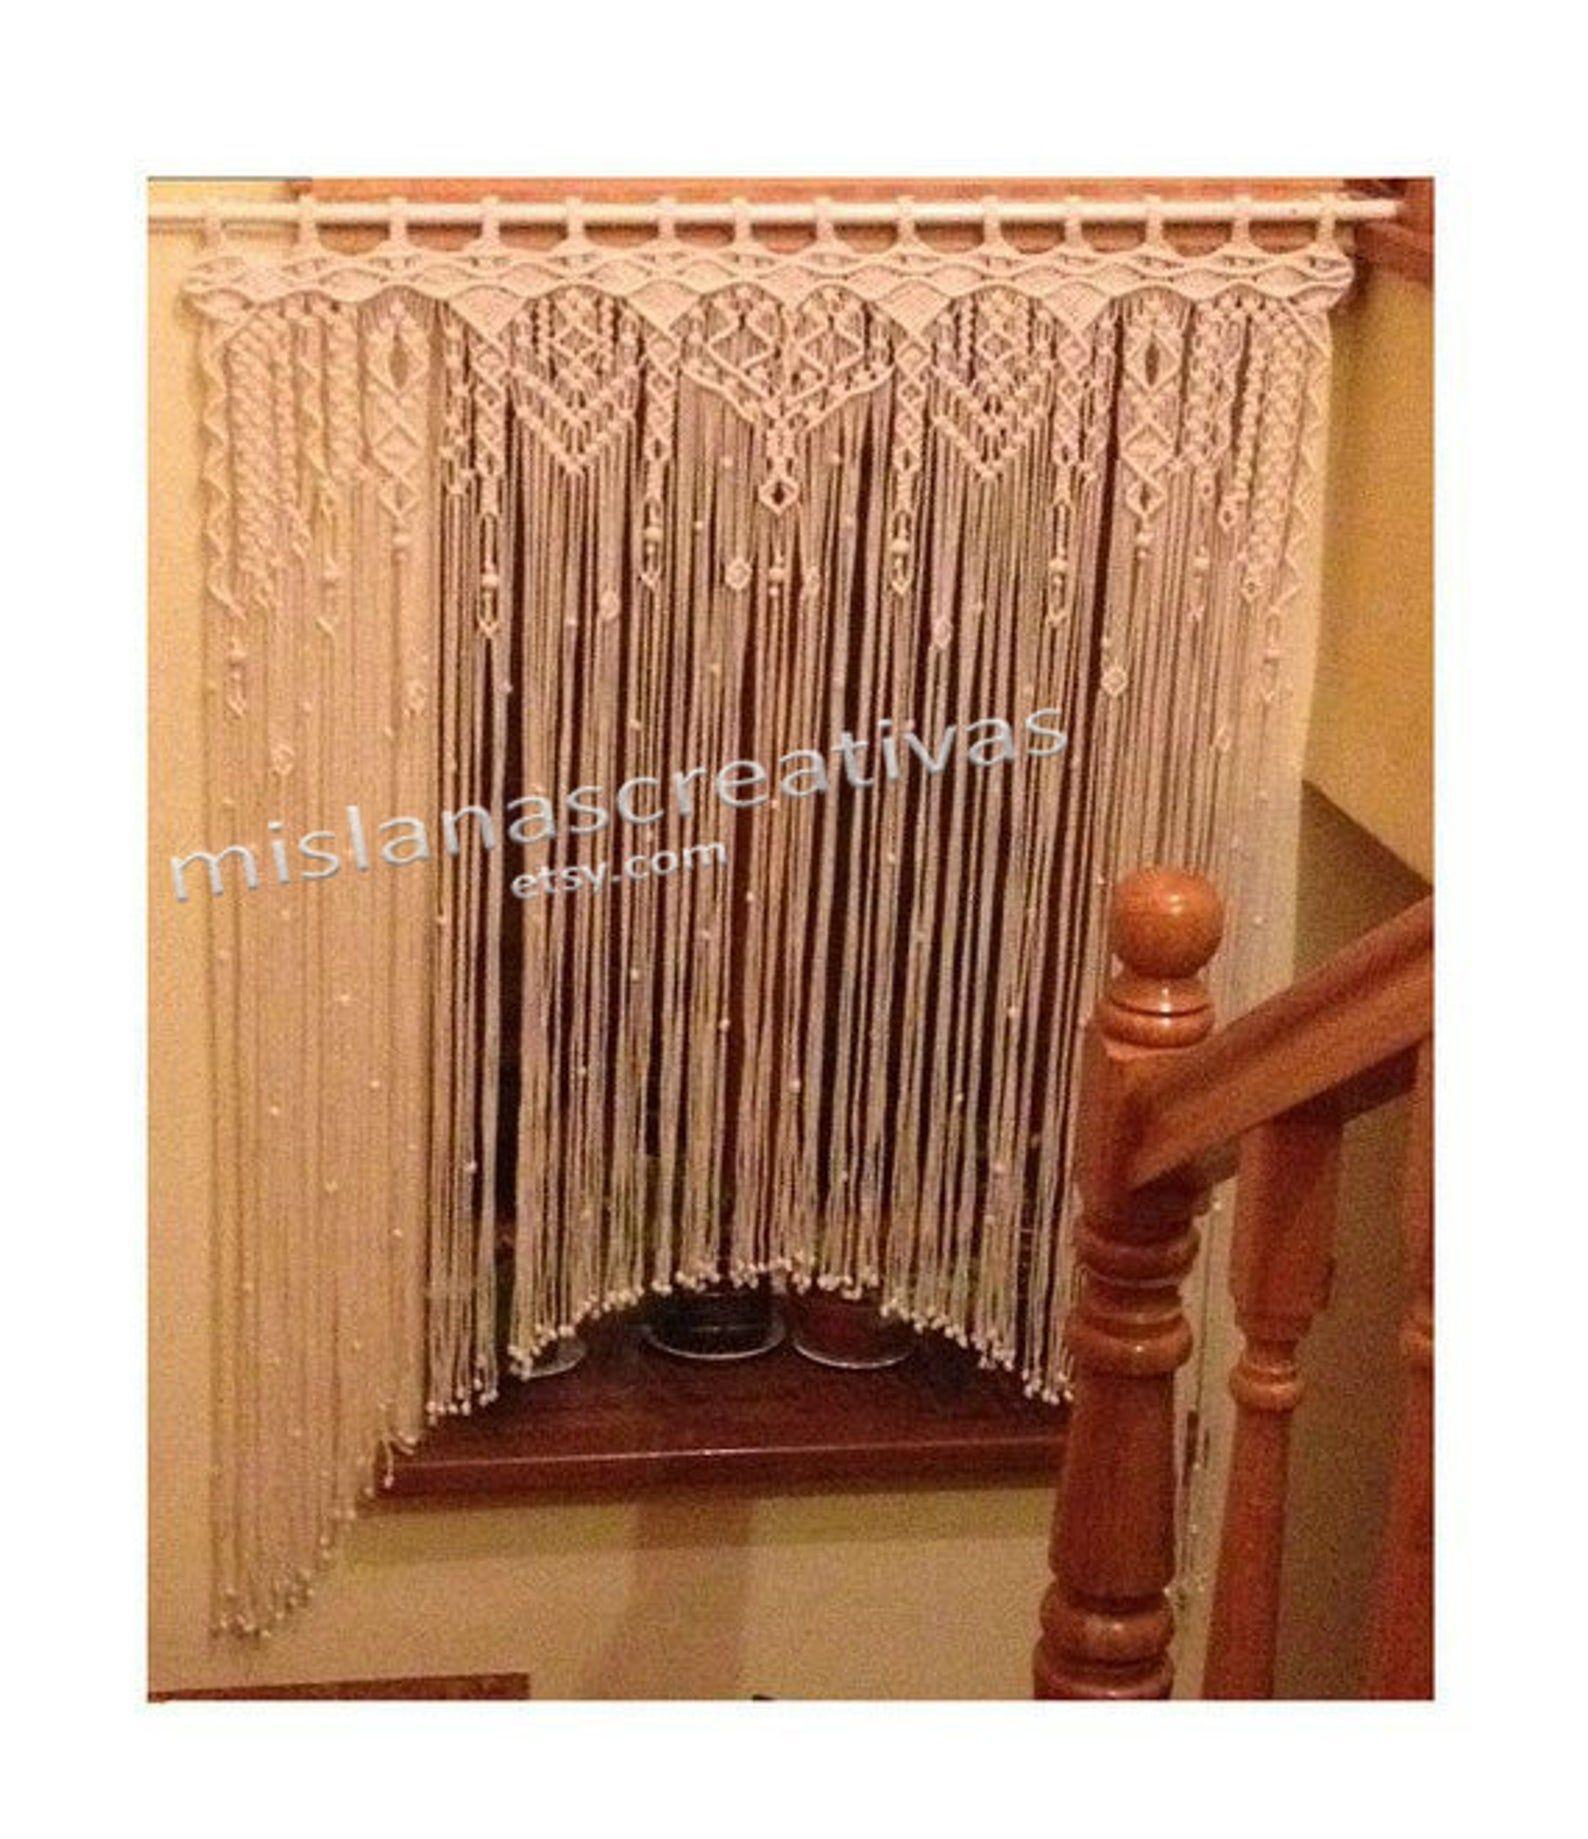 Macrame Curtain, Large macrame, Macrame fiber art,  Macrame Curtain, W 46in x H 59in, #46in #59in #Art #curtain #Fiber #Large #Macrame